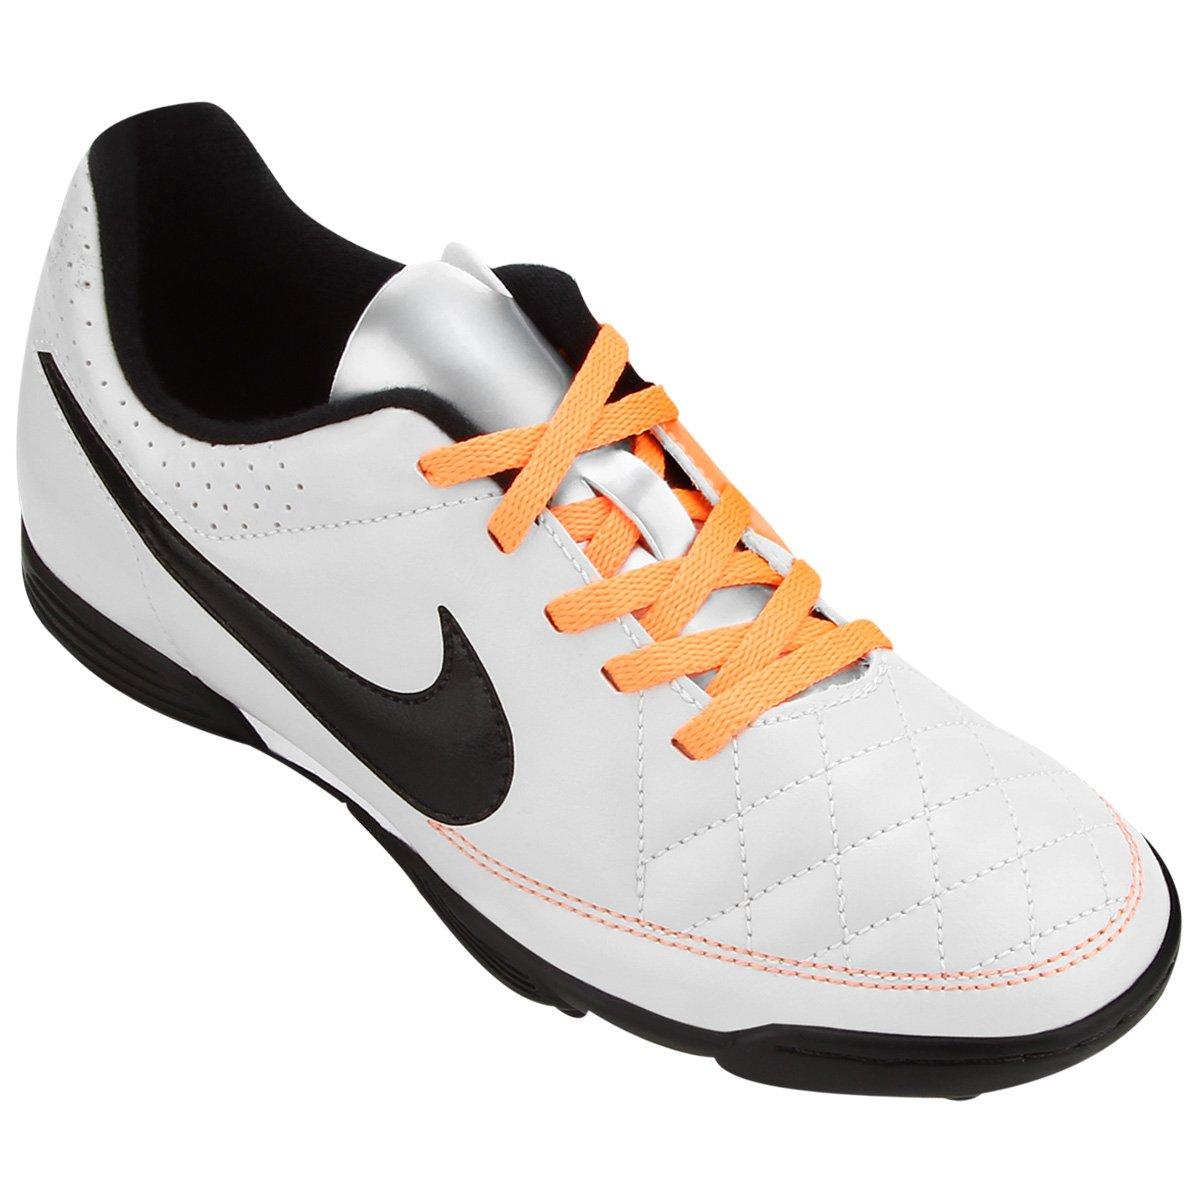 Chuteira Nike Tiempo Rio 2 TF Society Infantil - Compre Agora  83ee3cac89ca9